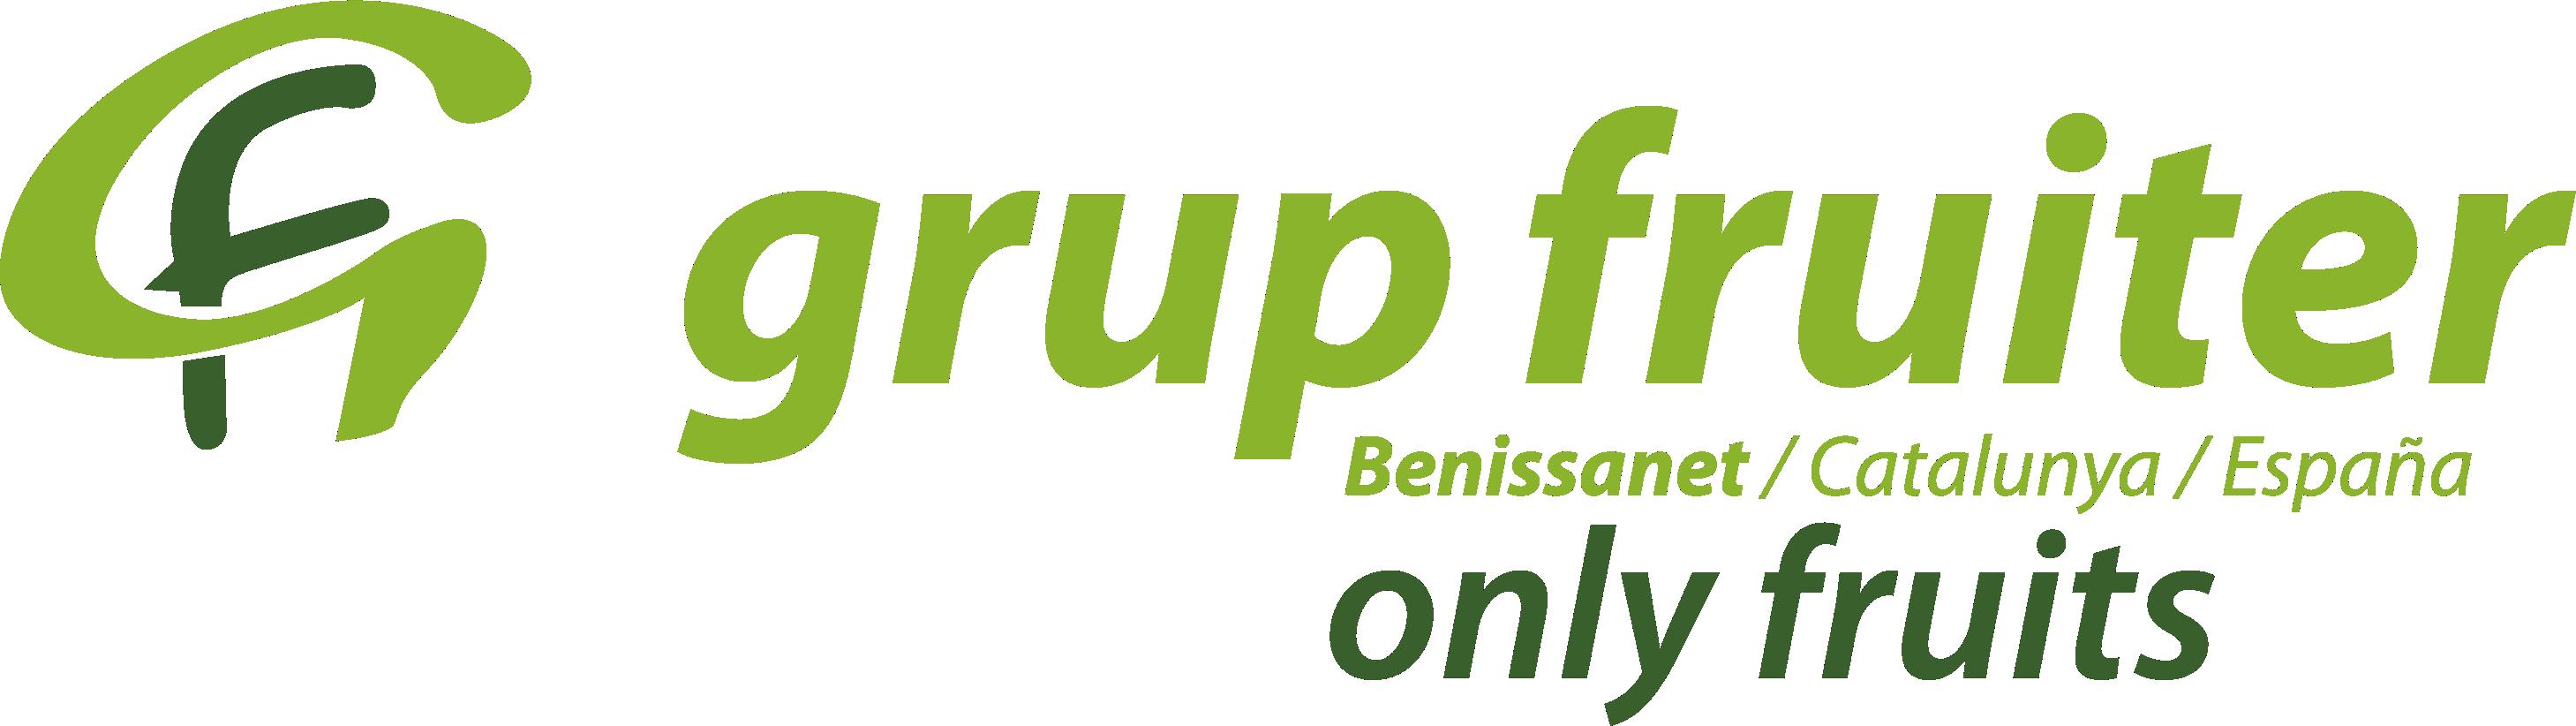 Grup Fruiter de Benissanet